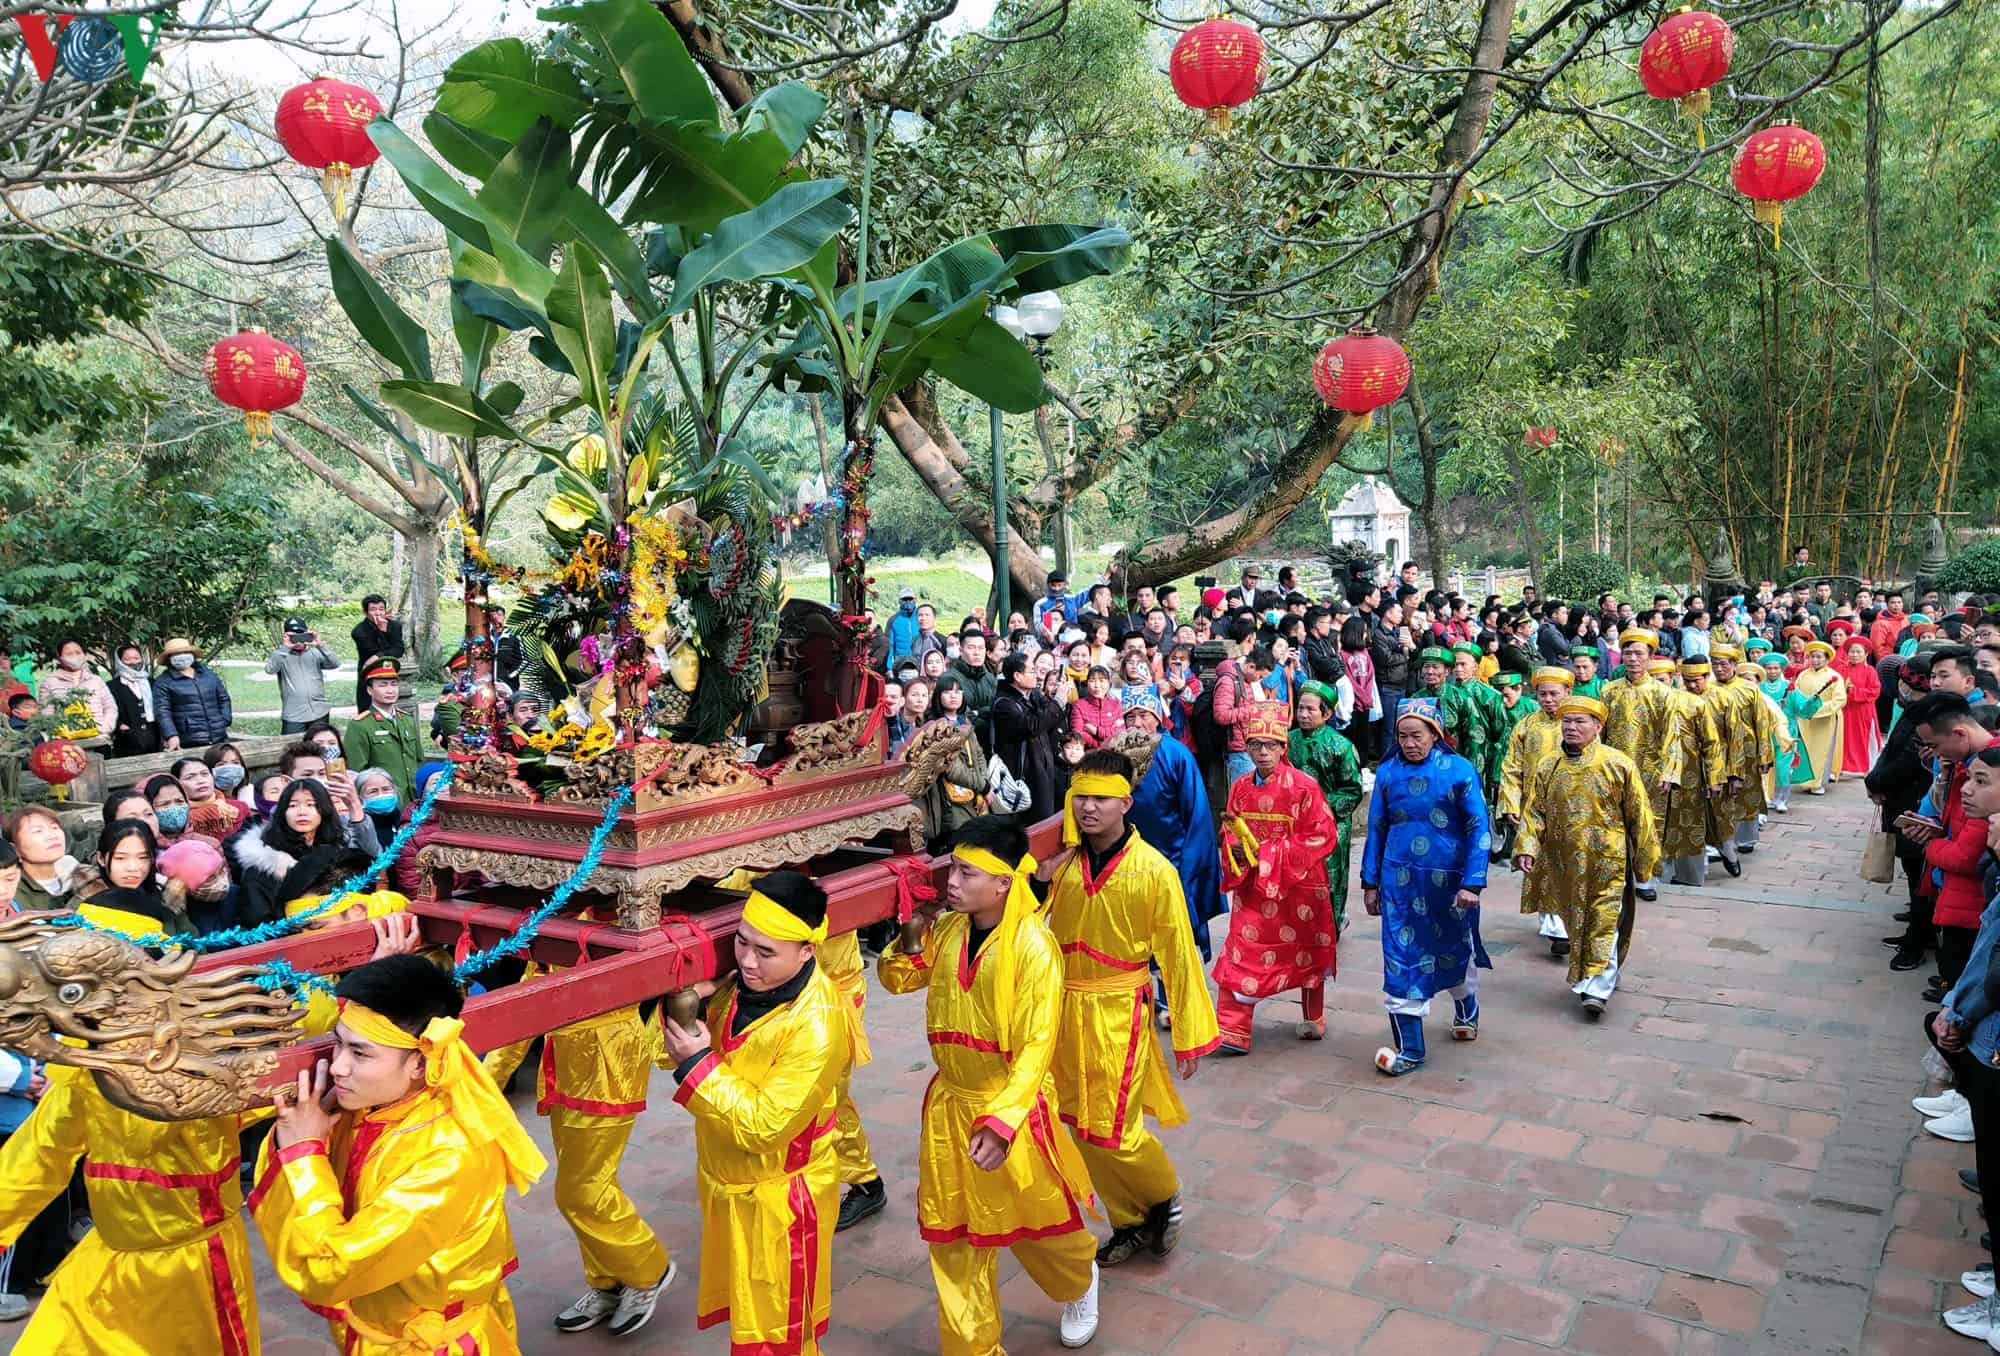 Fête et festival de Giong